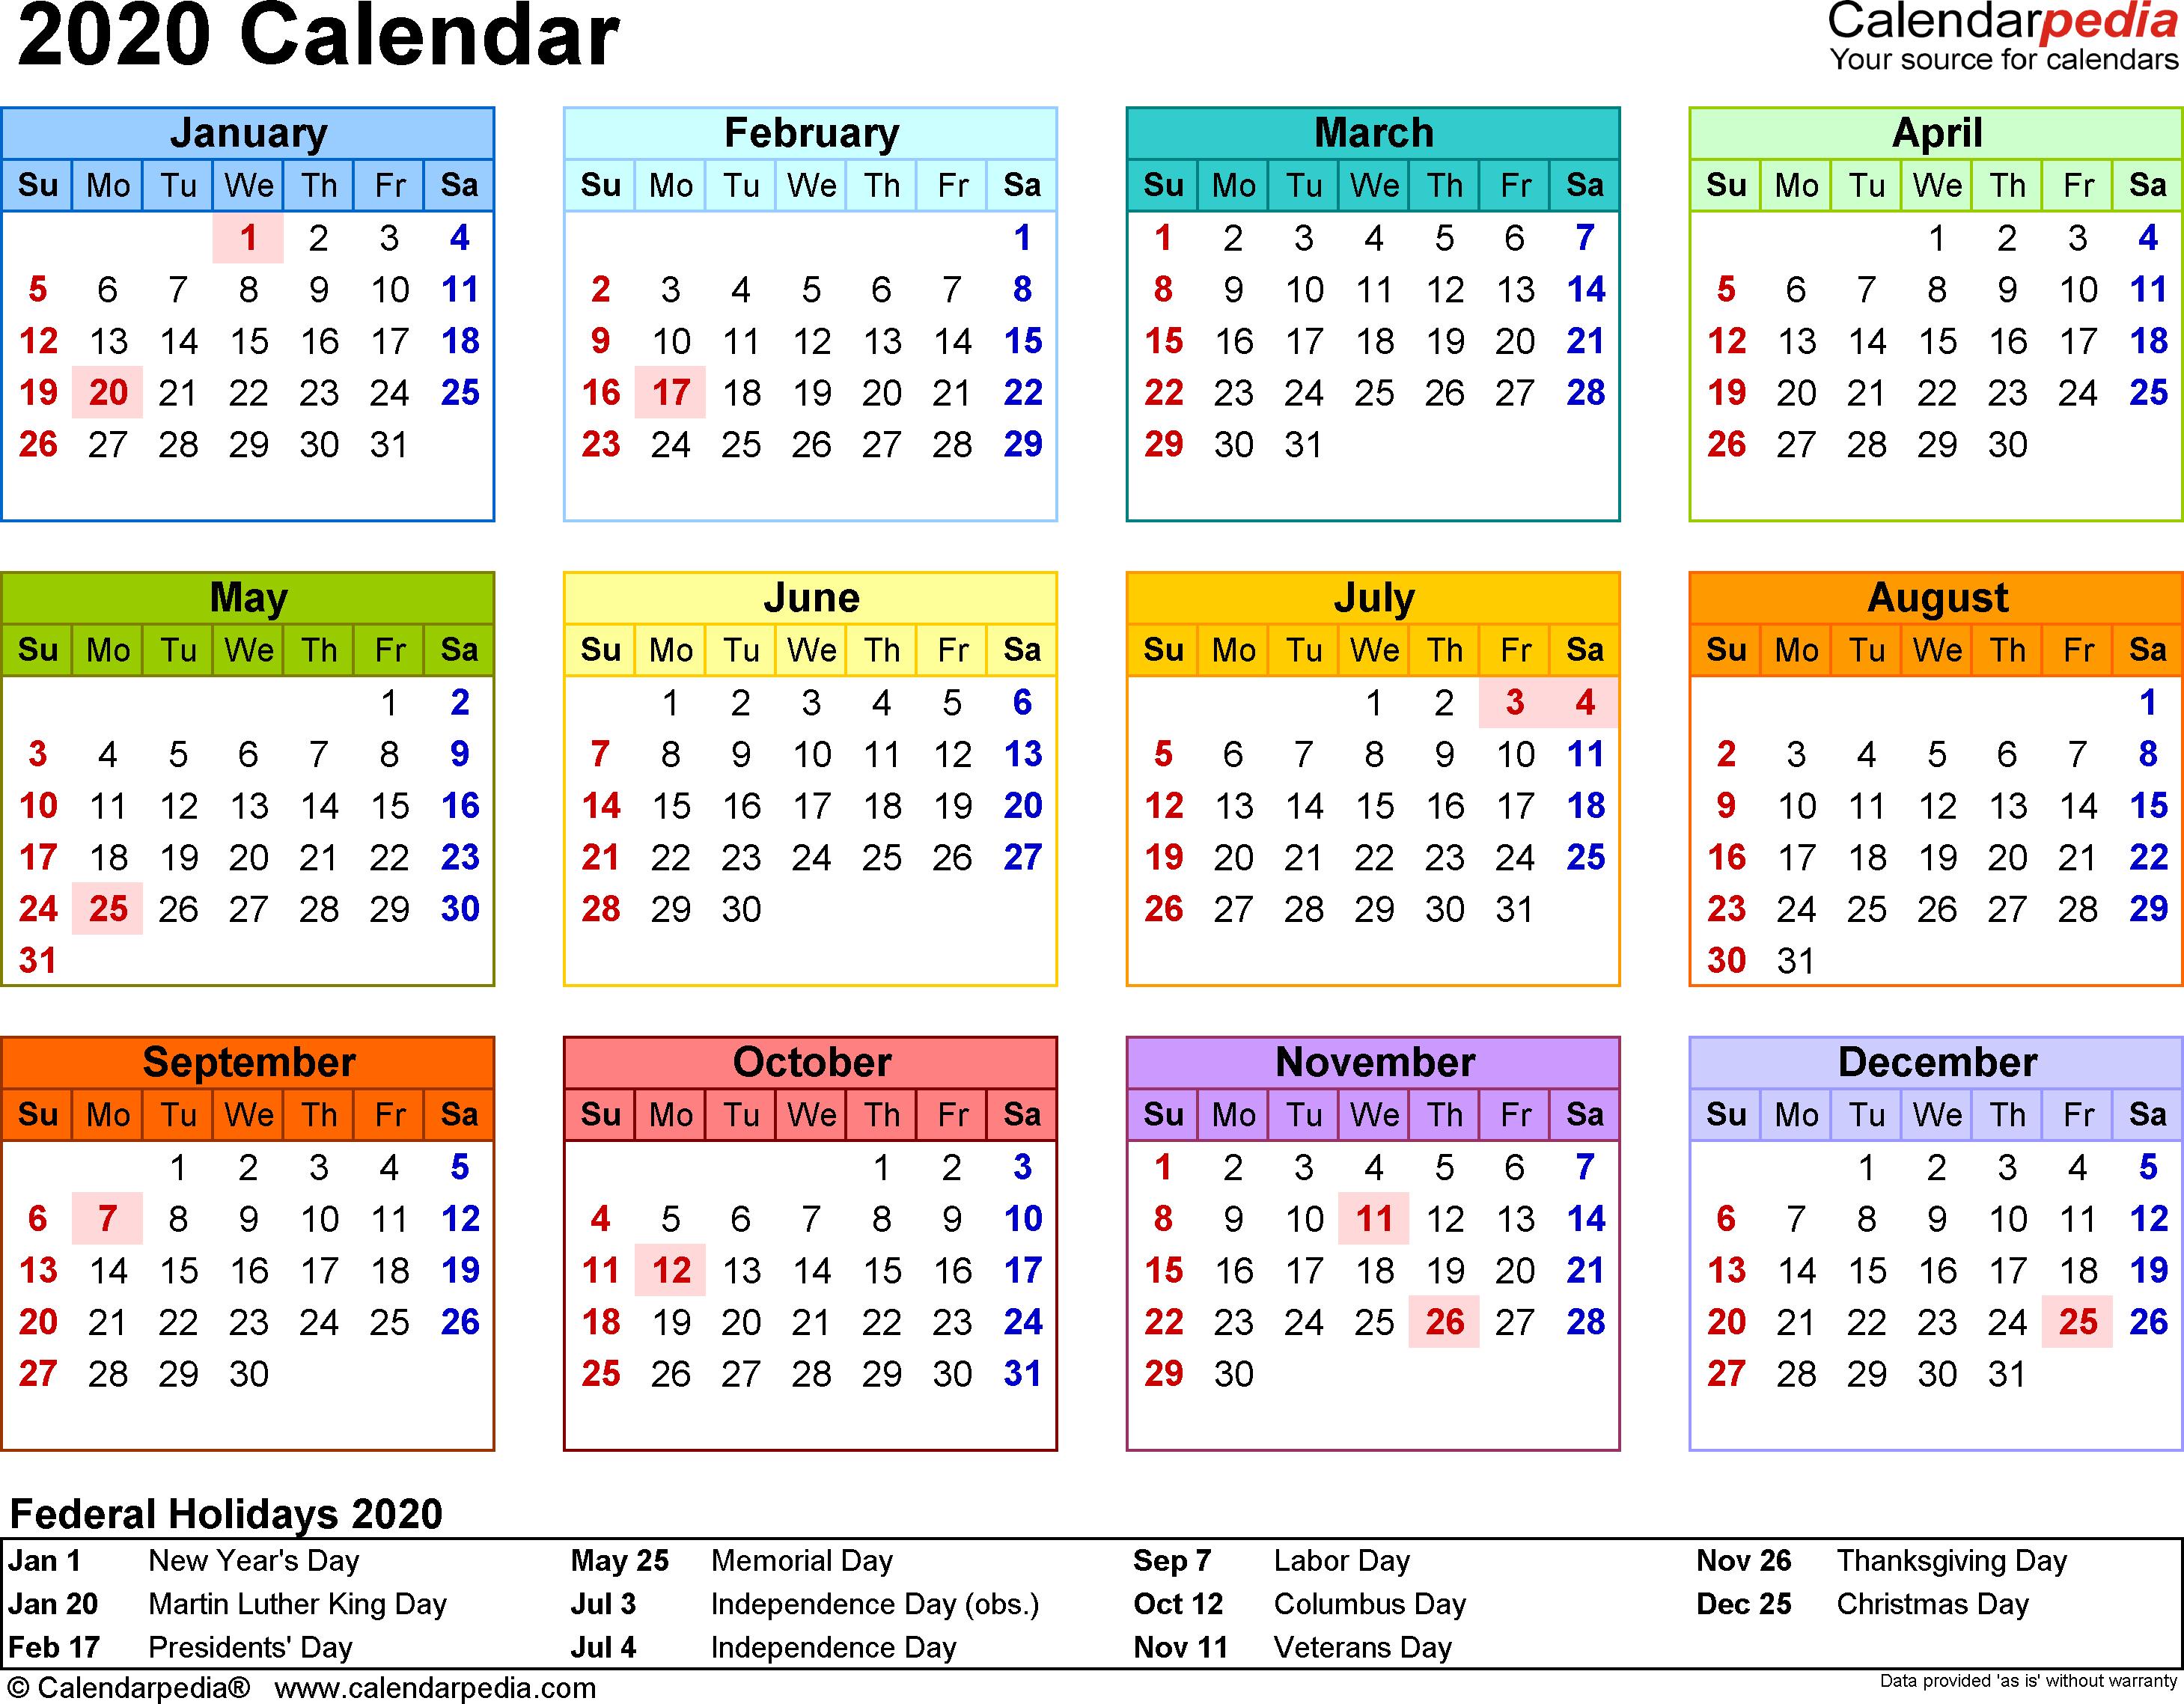 2020 Calendar Pdf - 17 Free Printable Calendar Templates